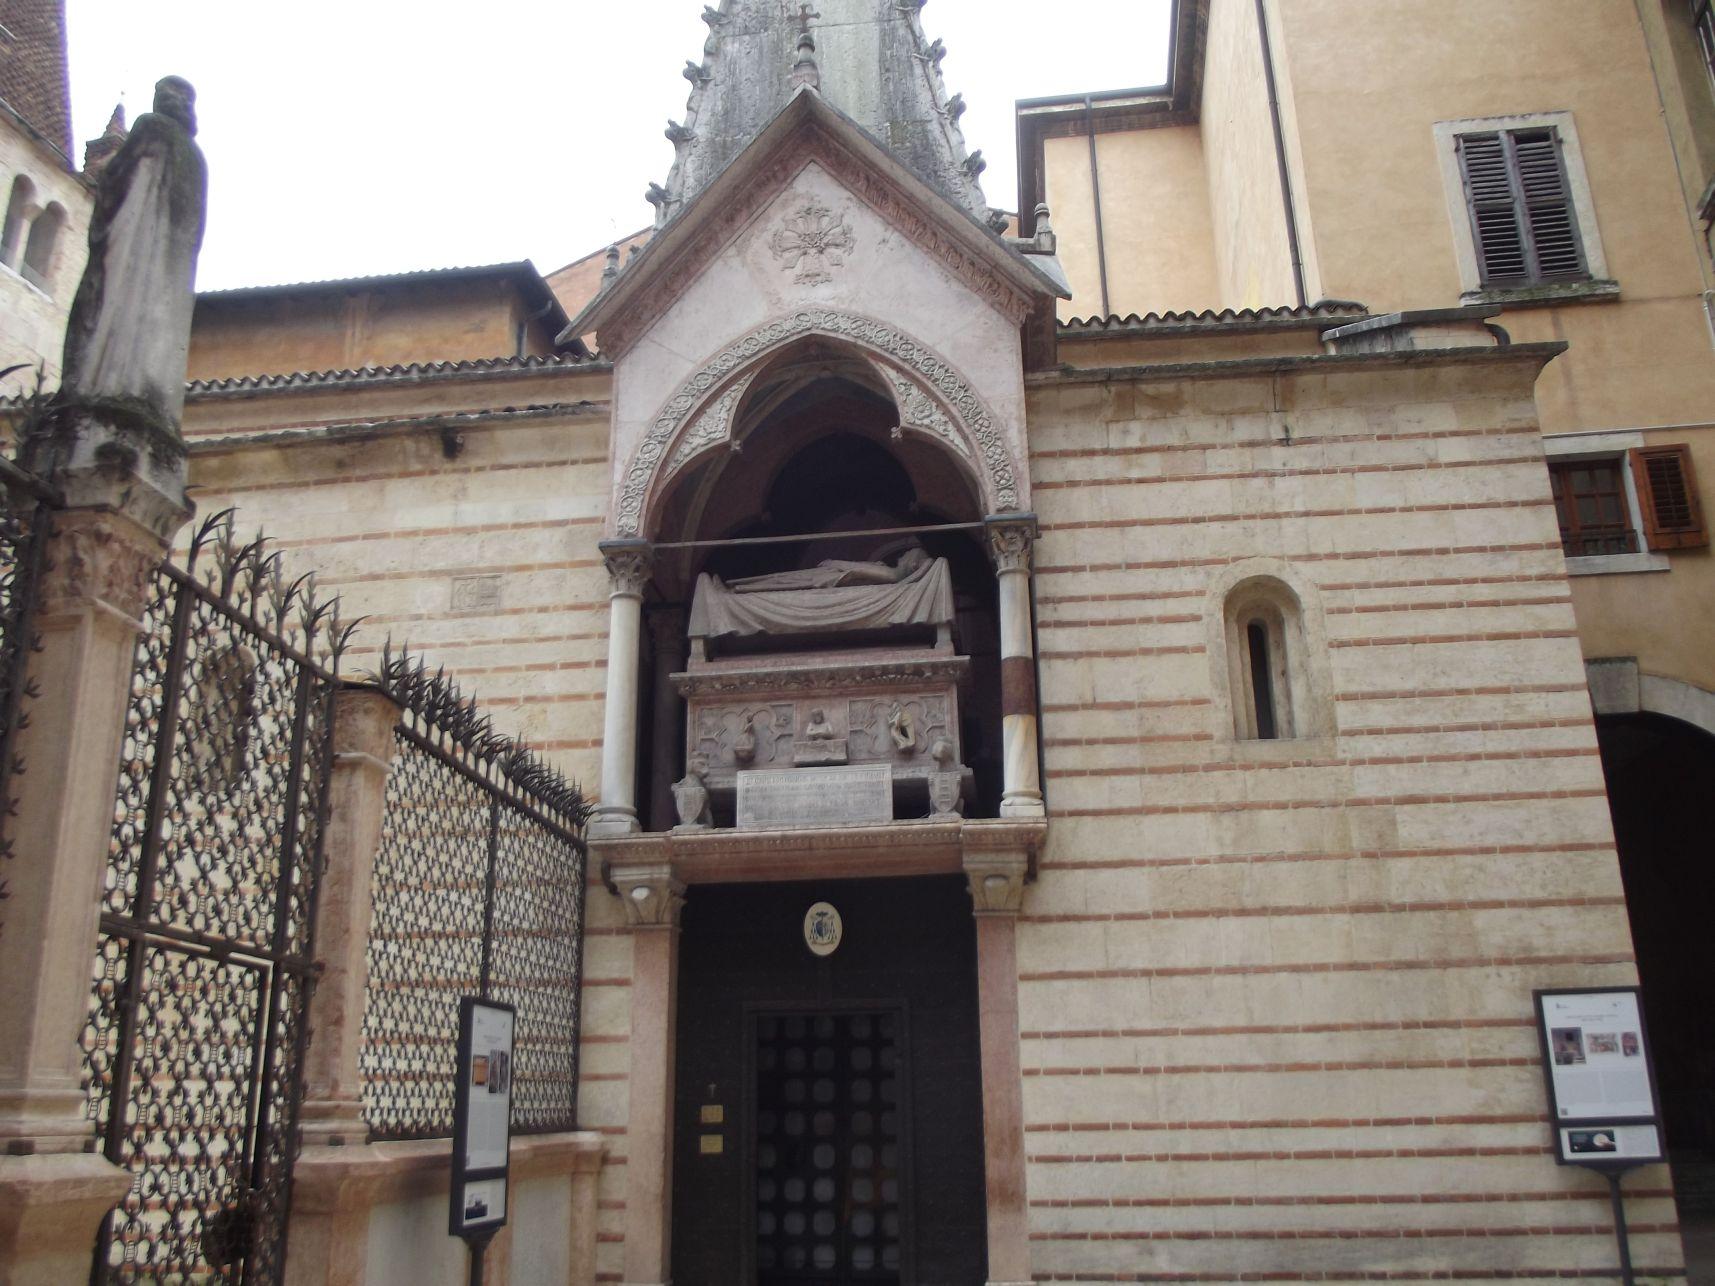 Veronai nemesek nyughelye